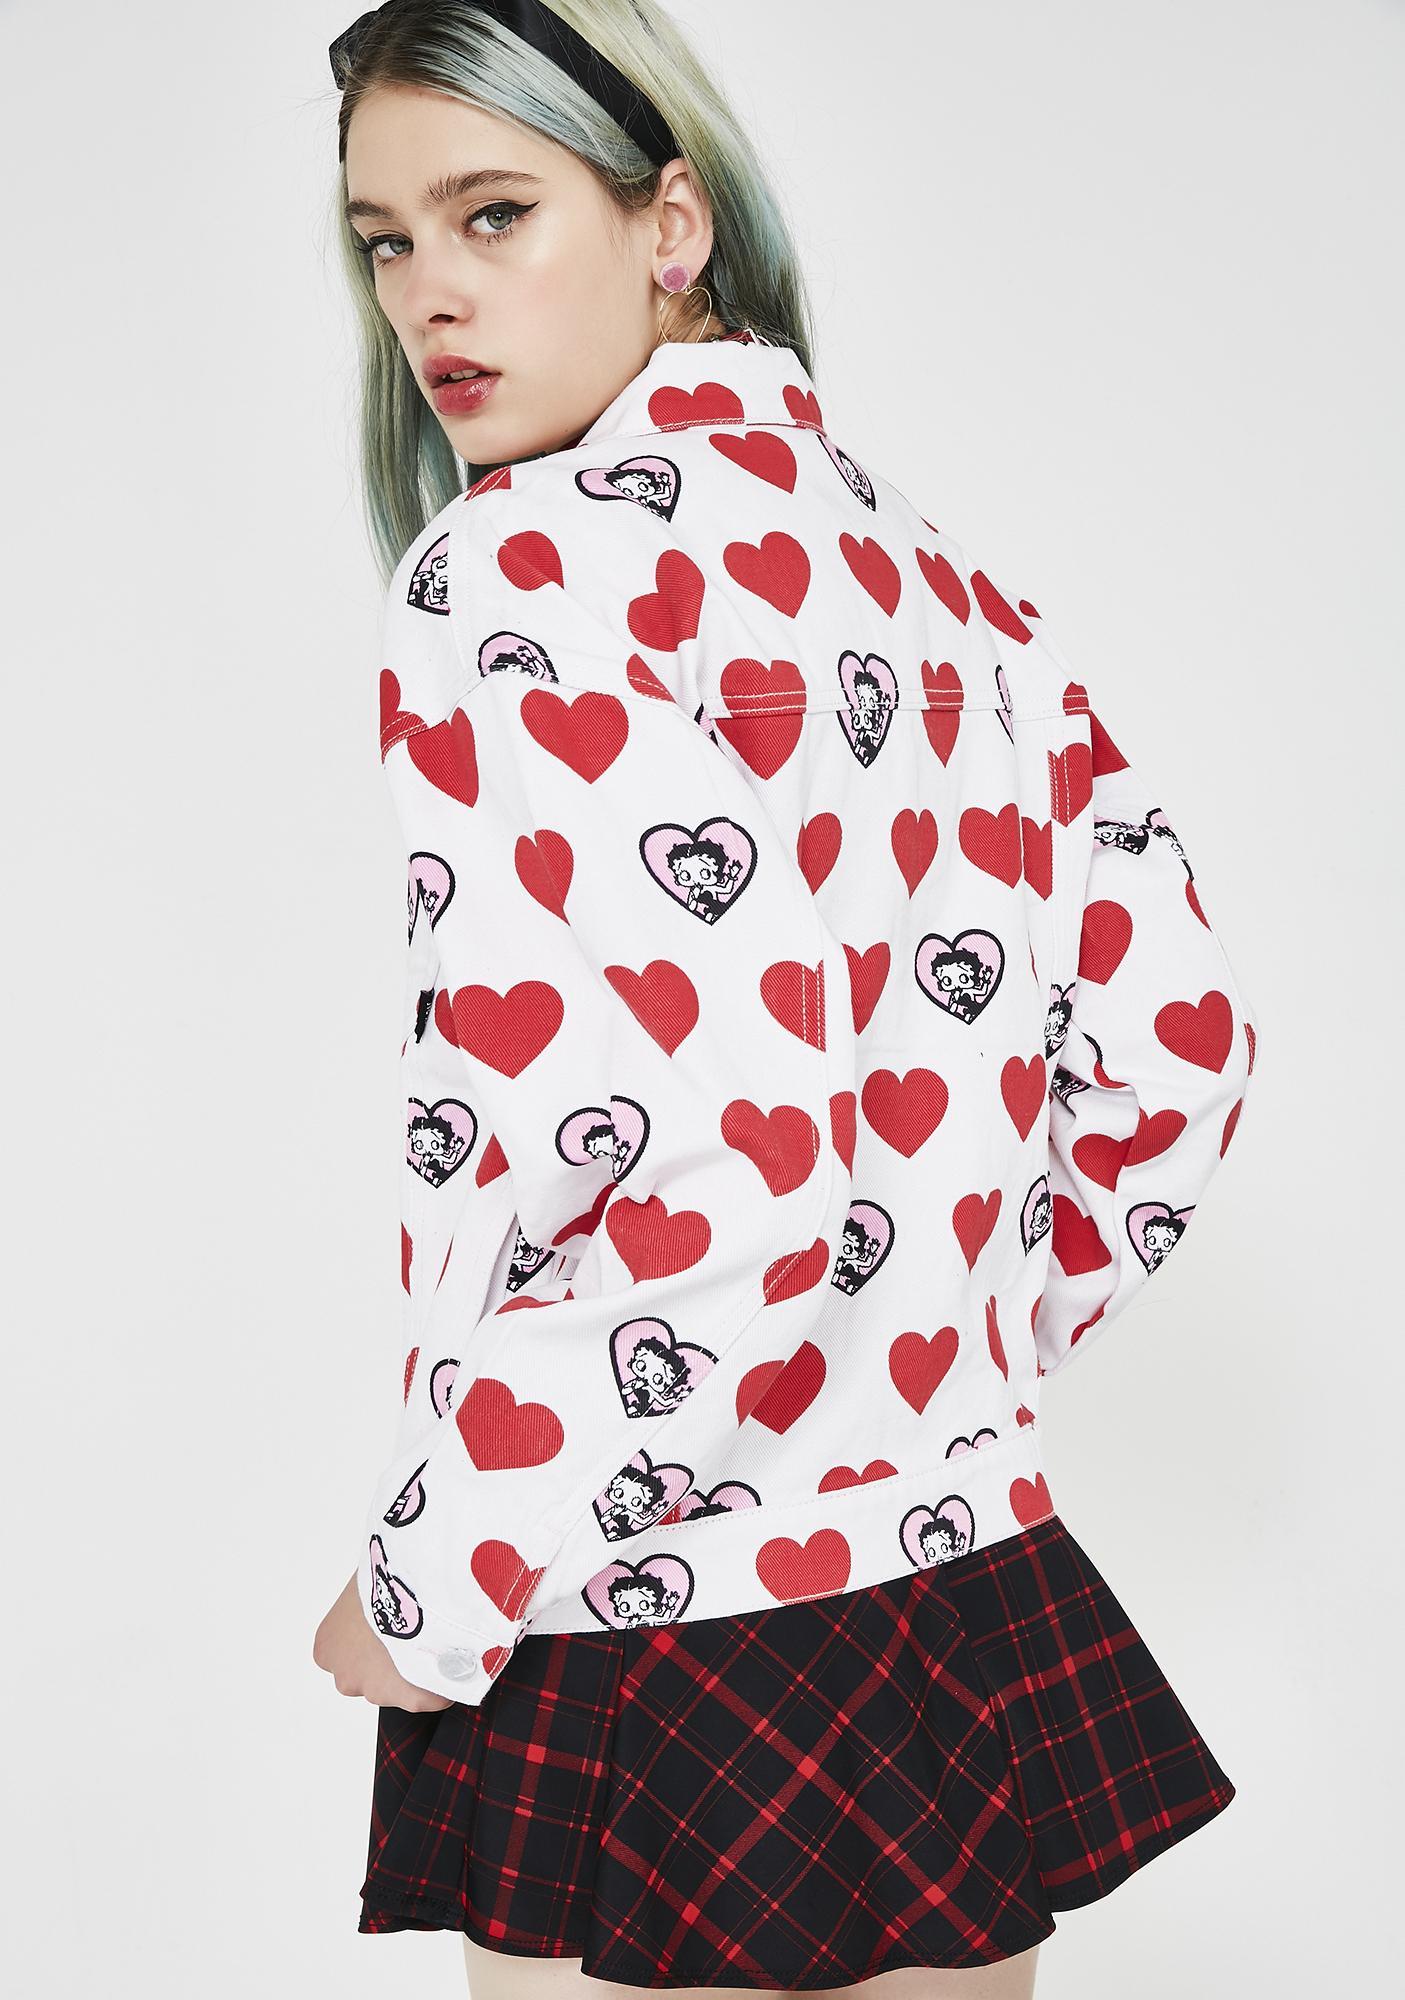 Lazy Oaf Betty Boop Heart Jacket